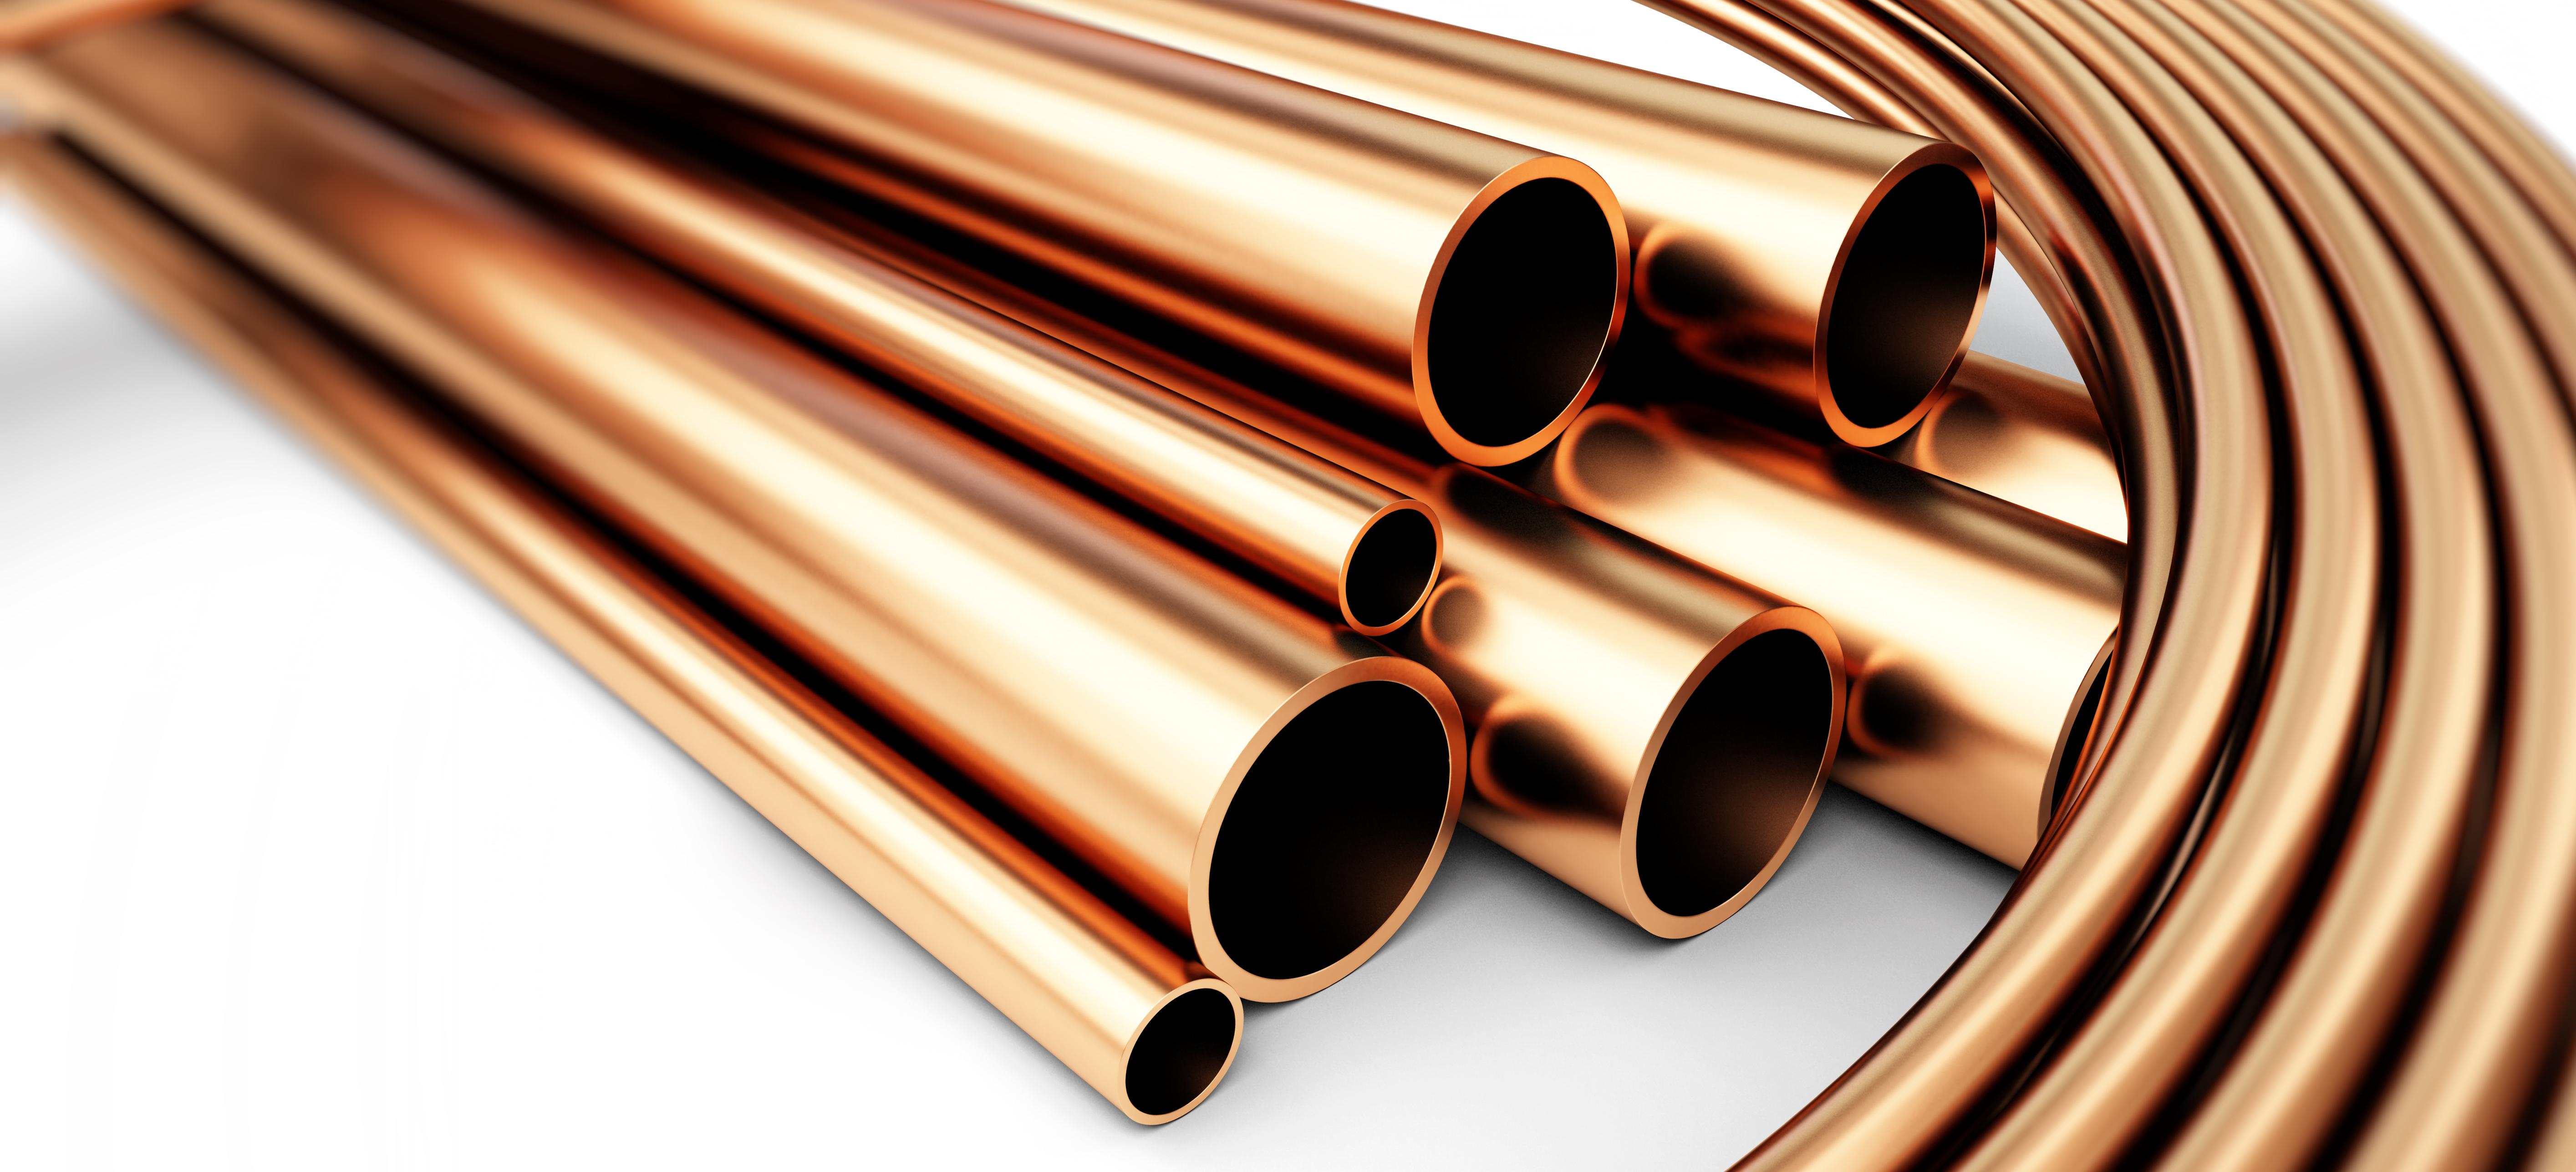 Copper Wave Analysis 28 December, 2020